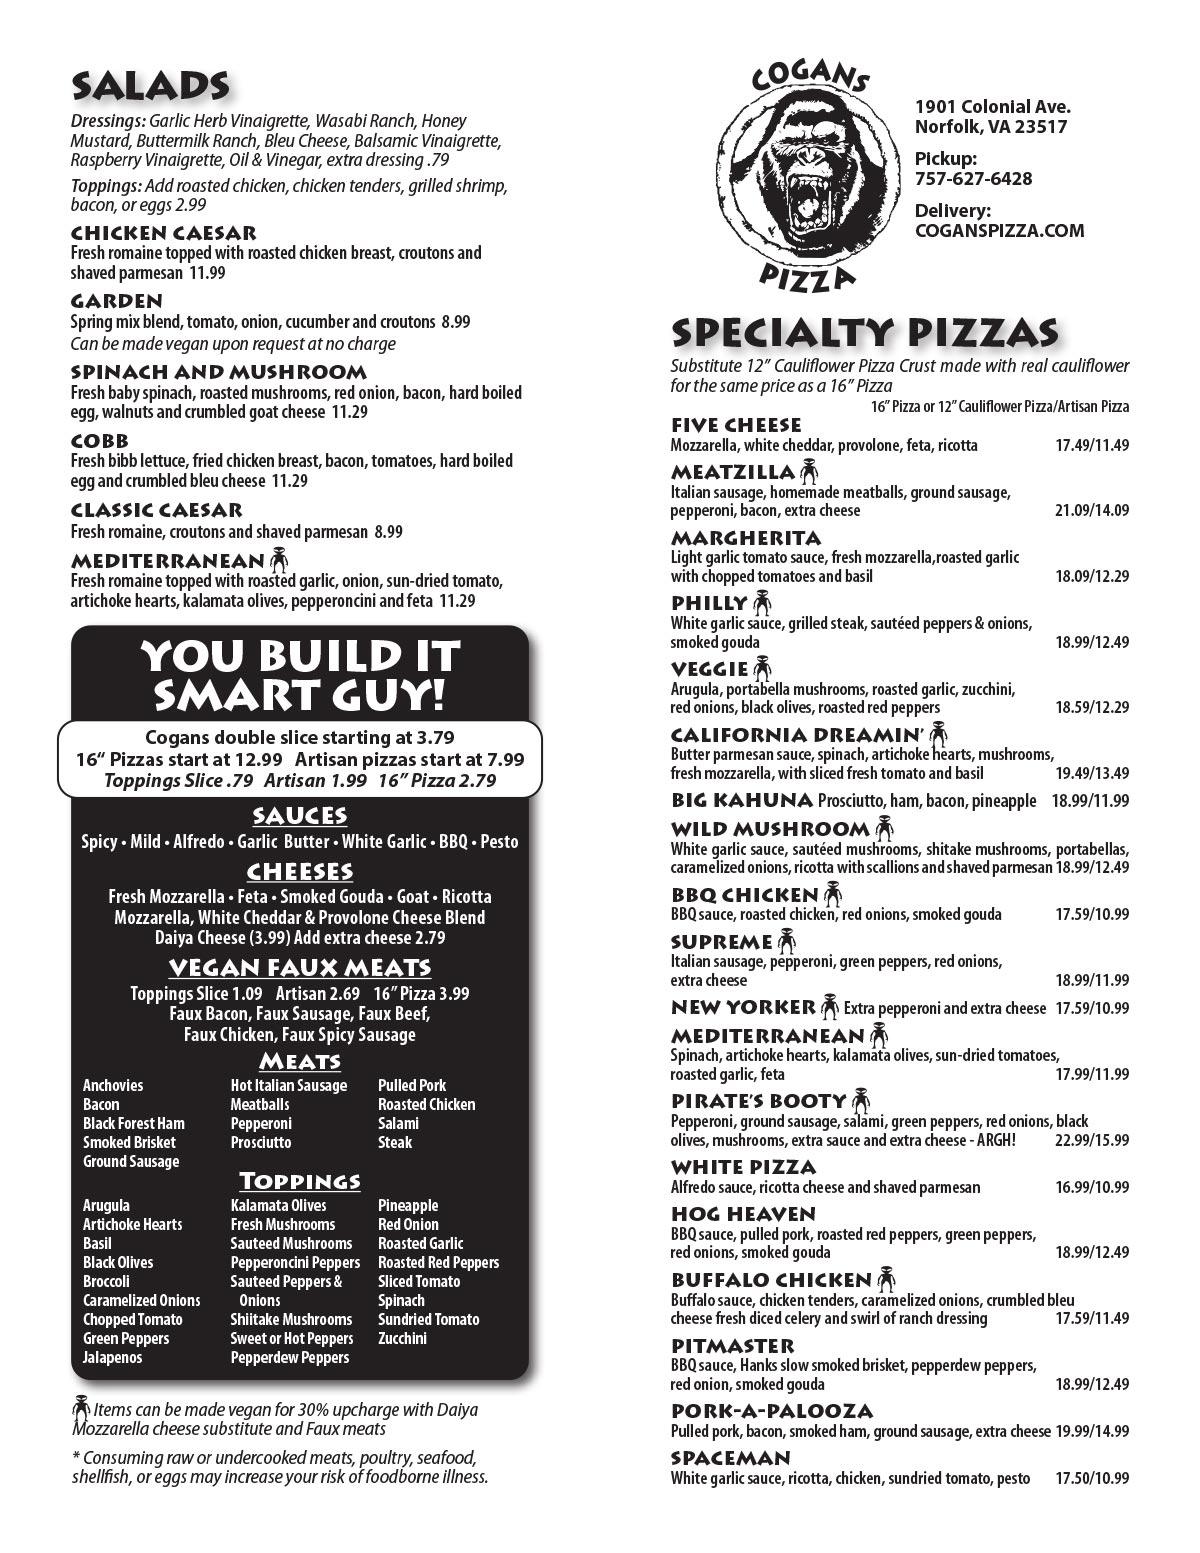 Cogans Pizza Ghent Menu